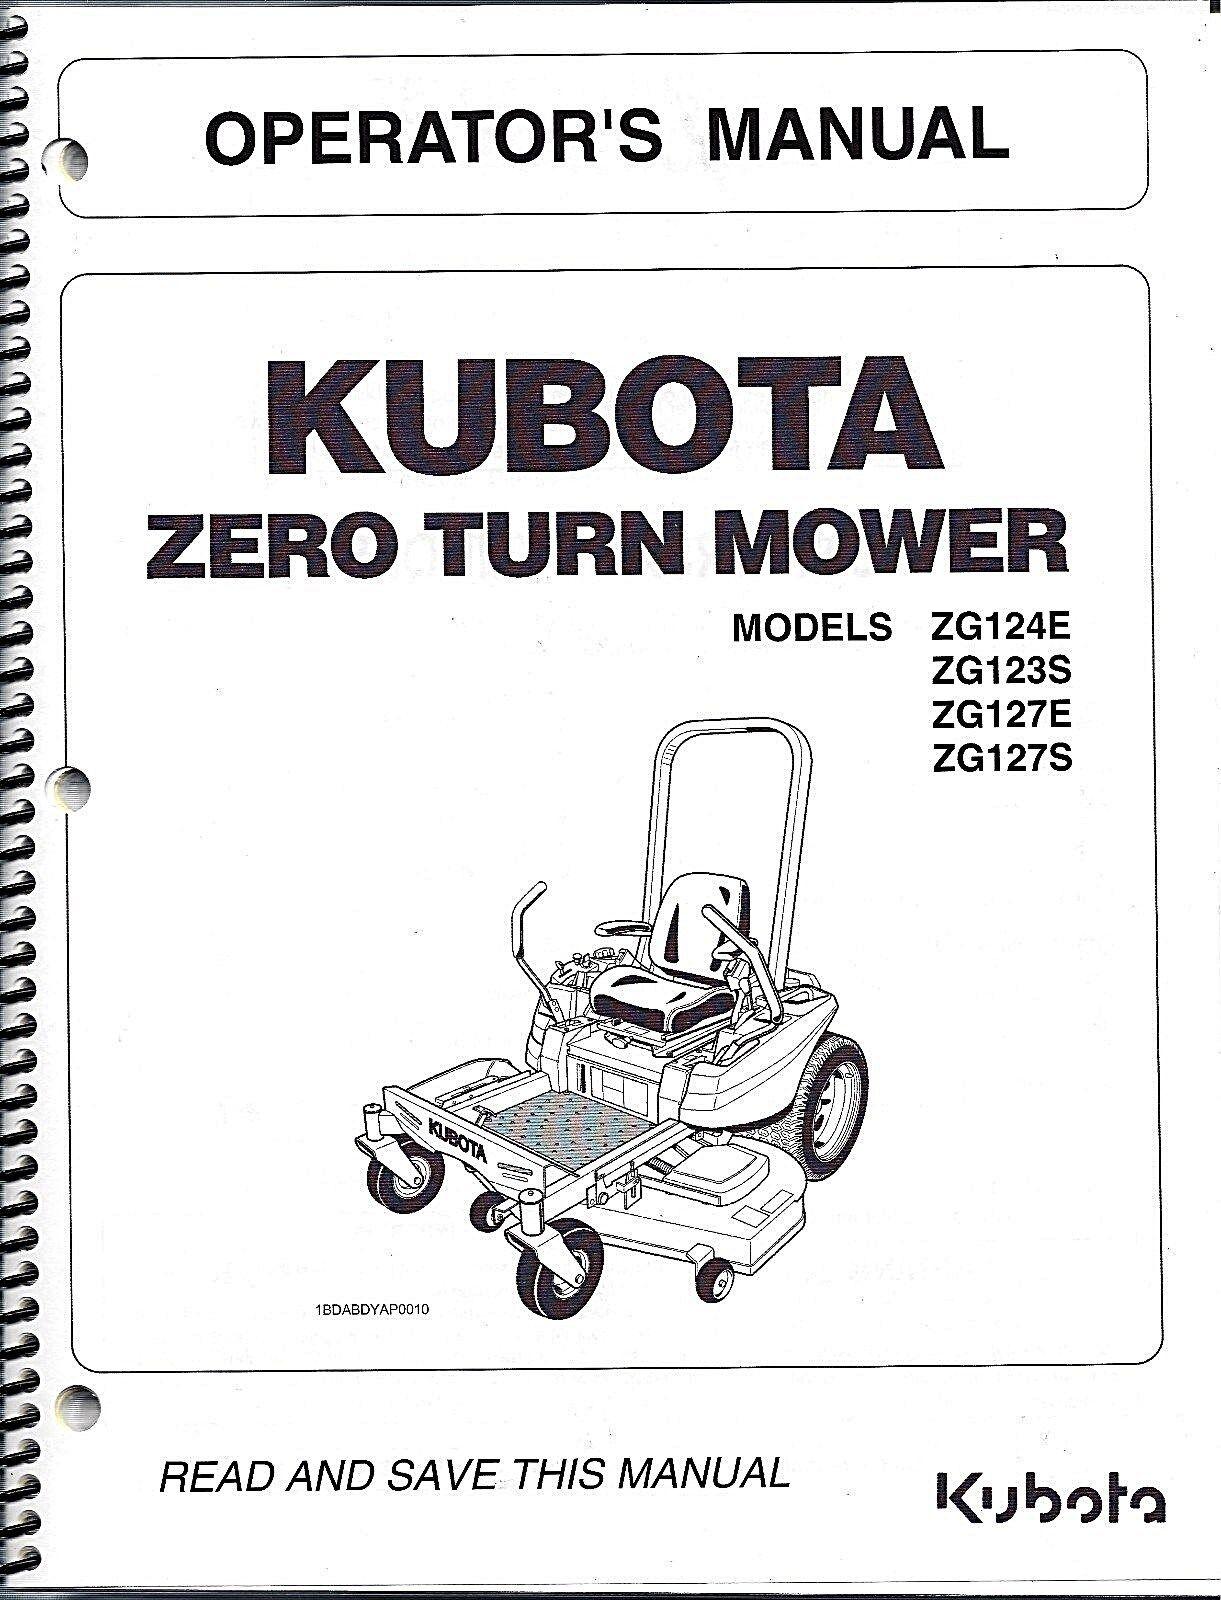 Bobcat Textron Zero Turn Manual